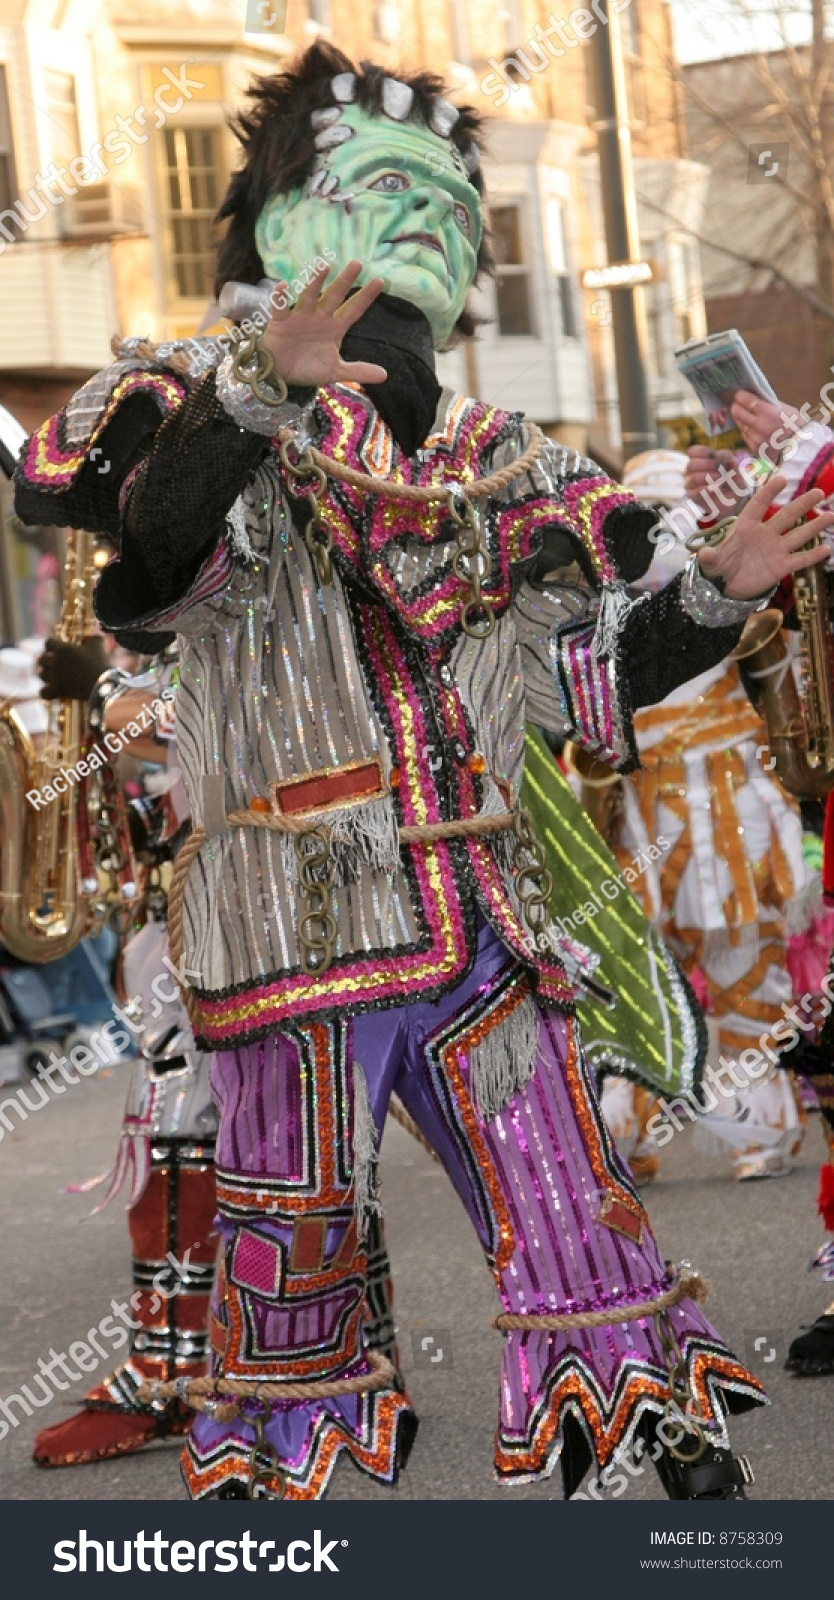 Philadelphia New Years Day Mummers Parade 2008 Stock Photo ...